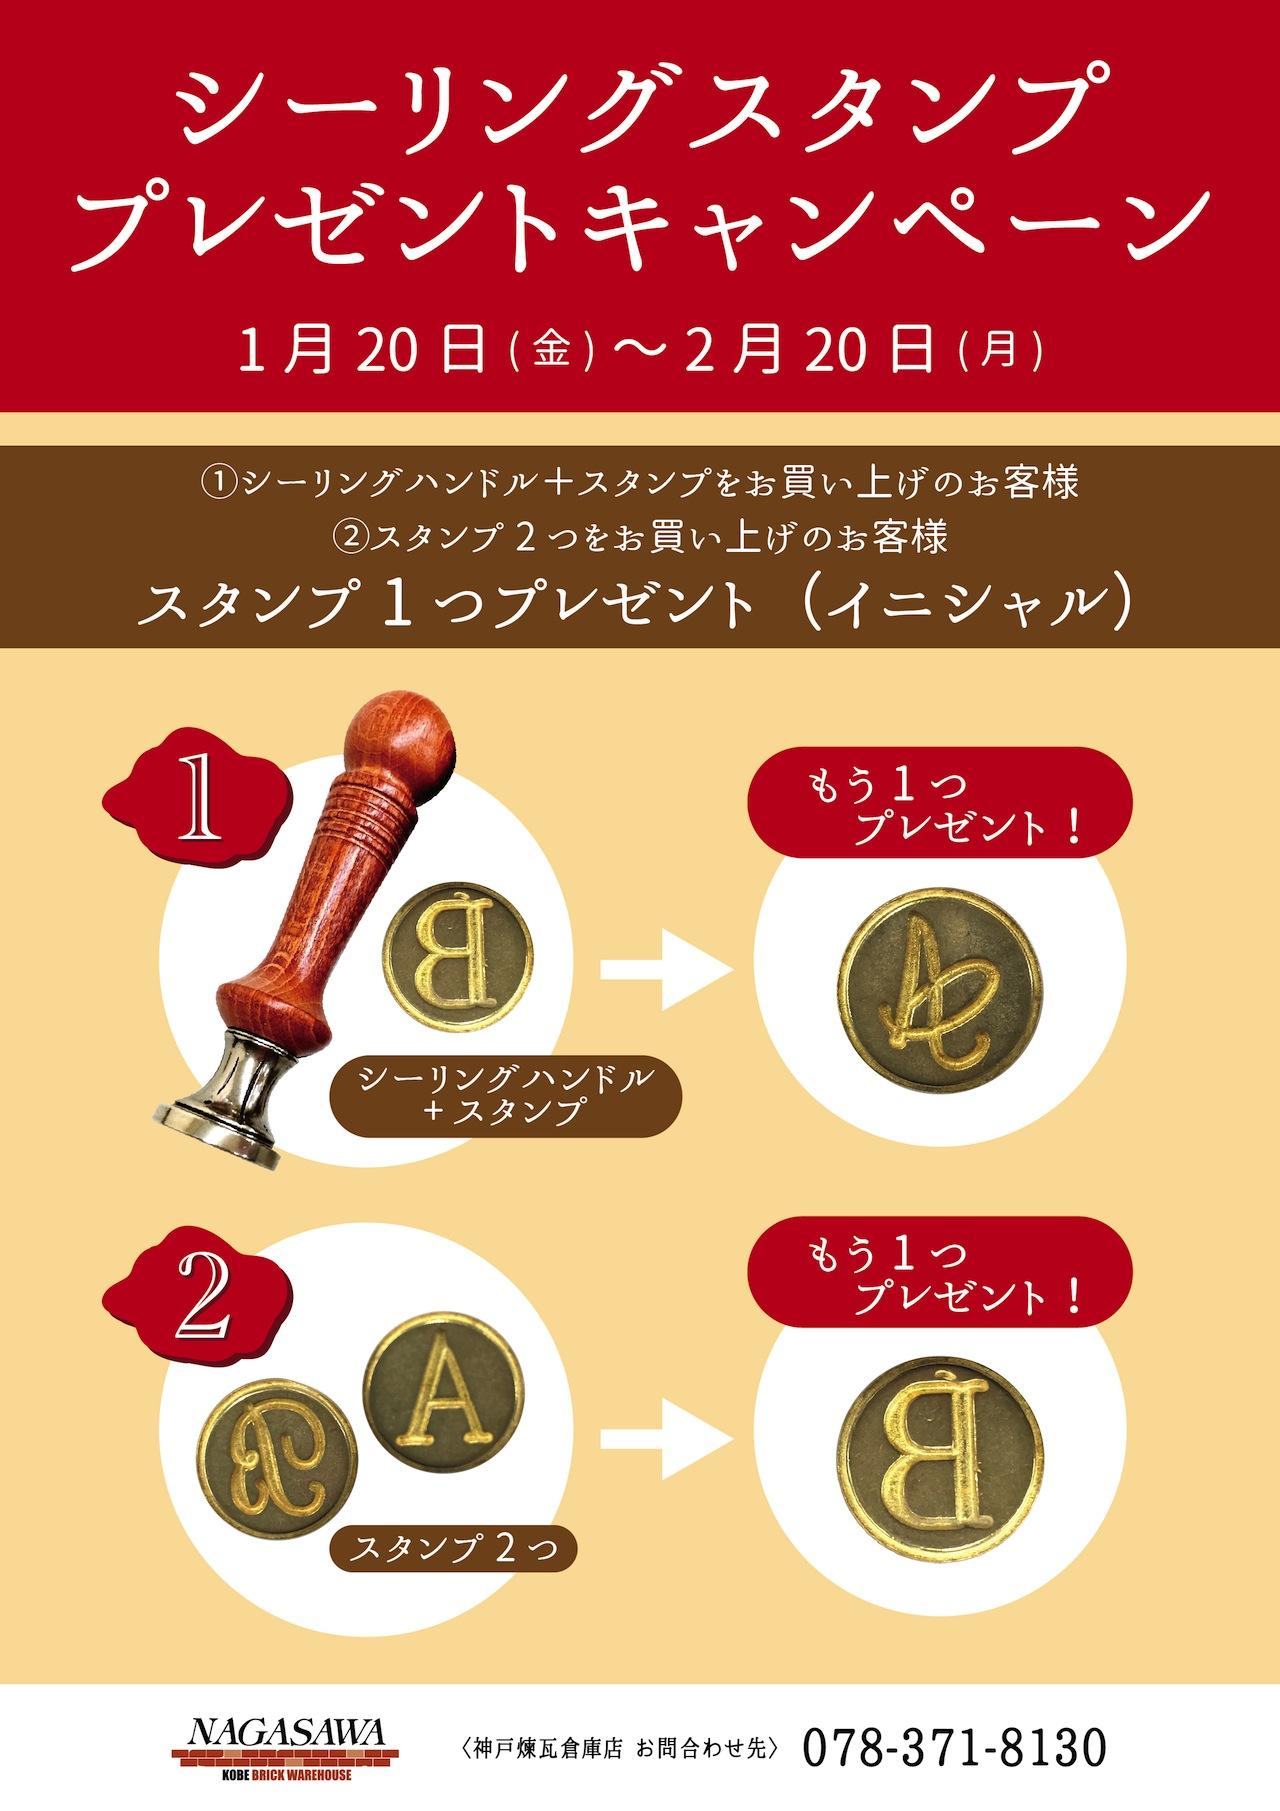 Bortoletti シーリングワックス 実演・体験会開催 @NAGASAWA神戸煉瓦倉庫店